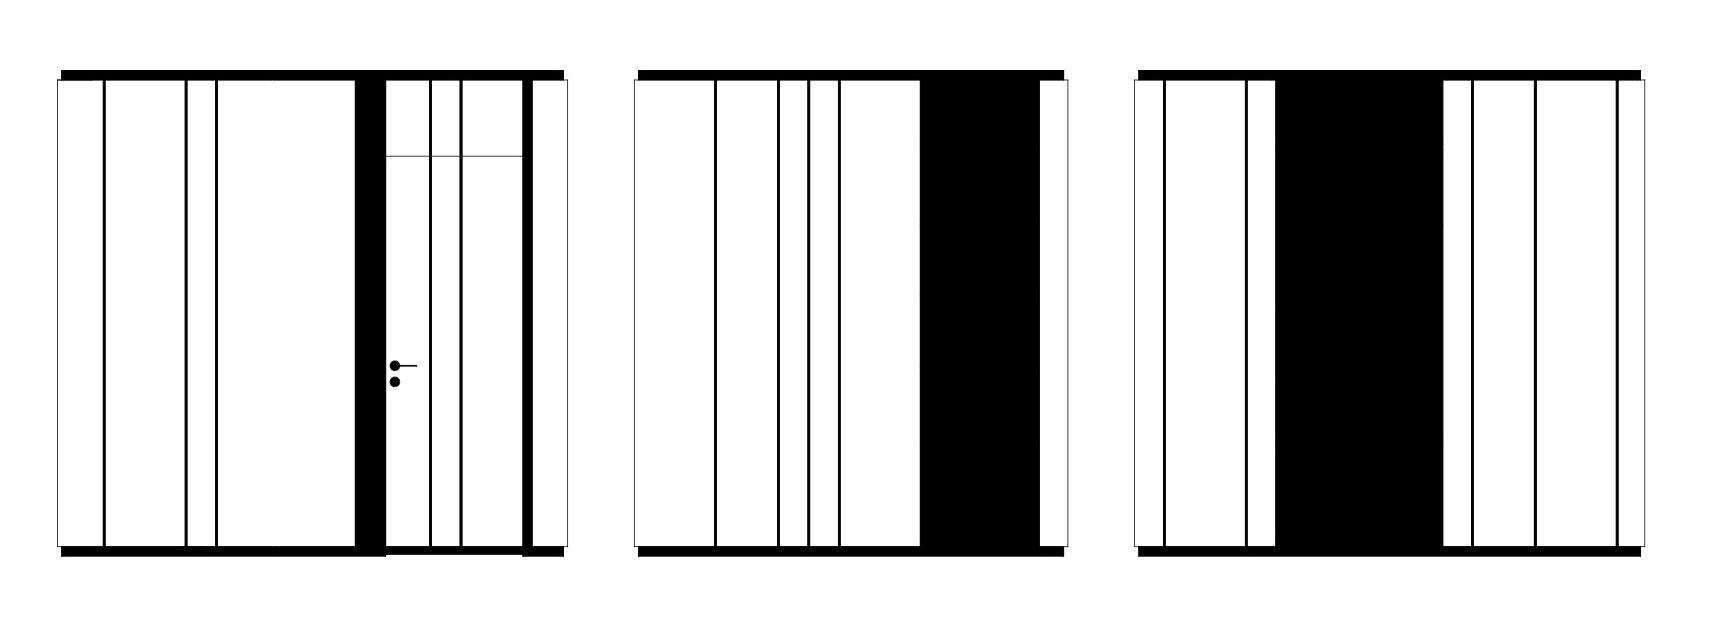 hannakarits-korter-sakala-vaade.jpg